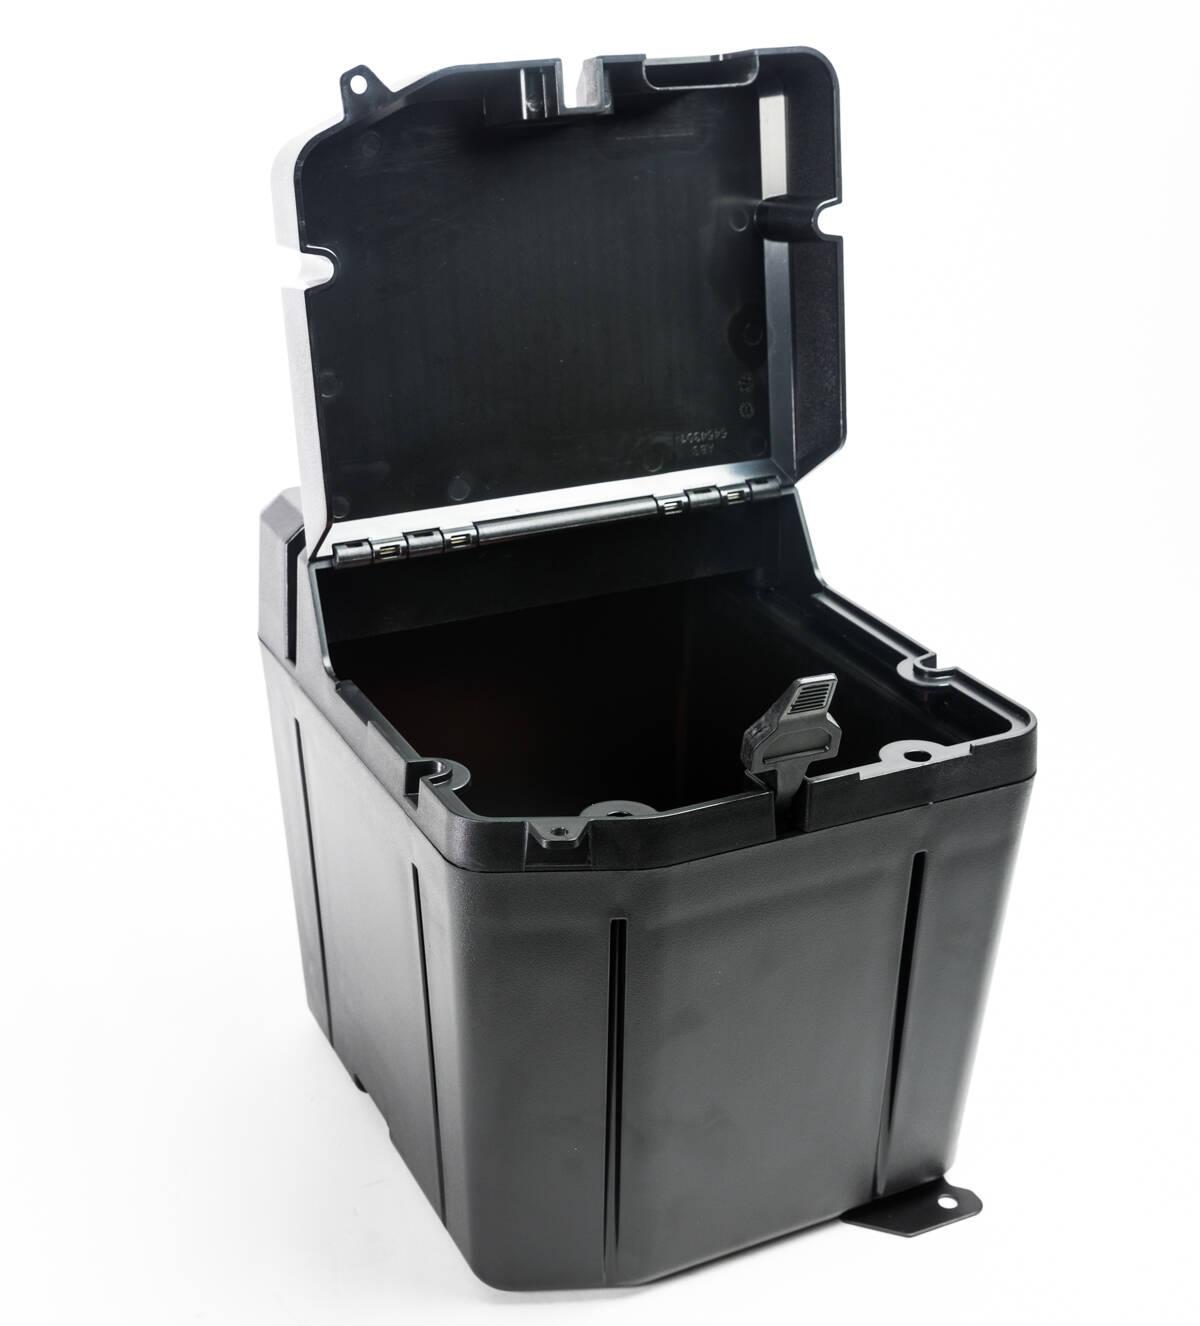 Replacement OEM #2882910 SAUTVS Ranger Dual Bin Under Seat Dry Storage Box Poly Water Resistant Underseat Storage Bin for Polaris Ranger XP 1000 Diesel EPS Accessories